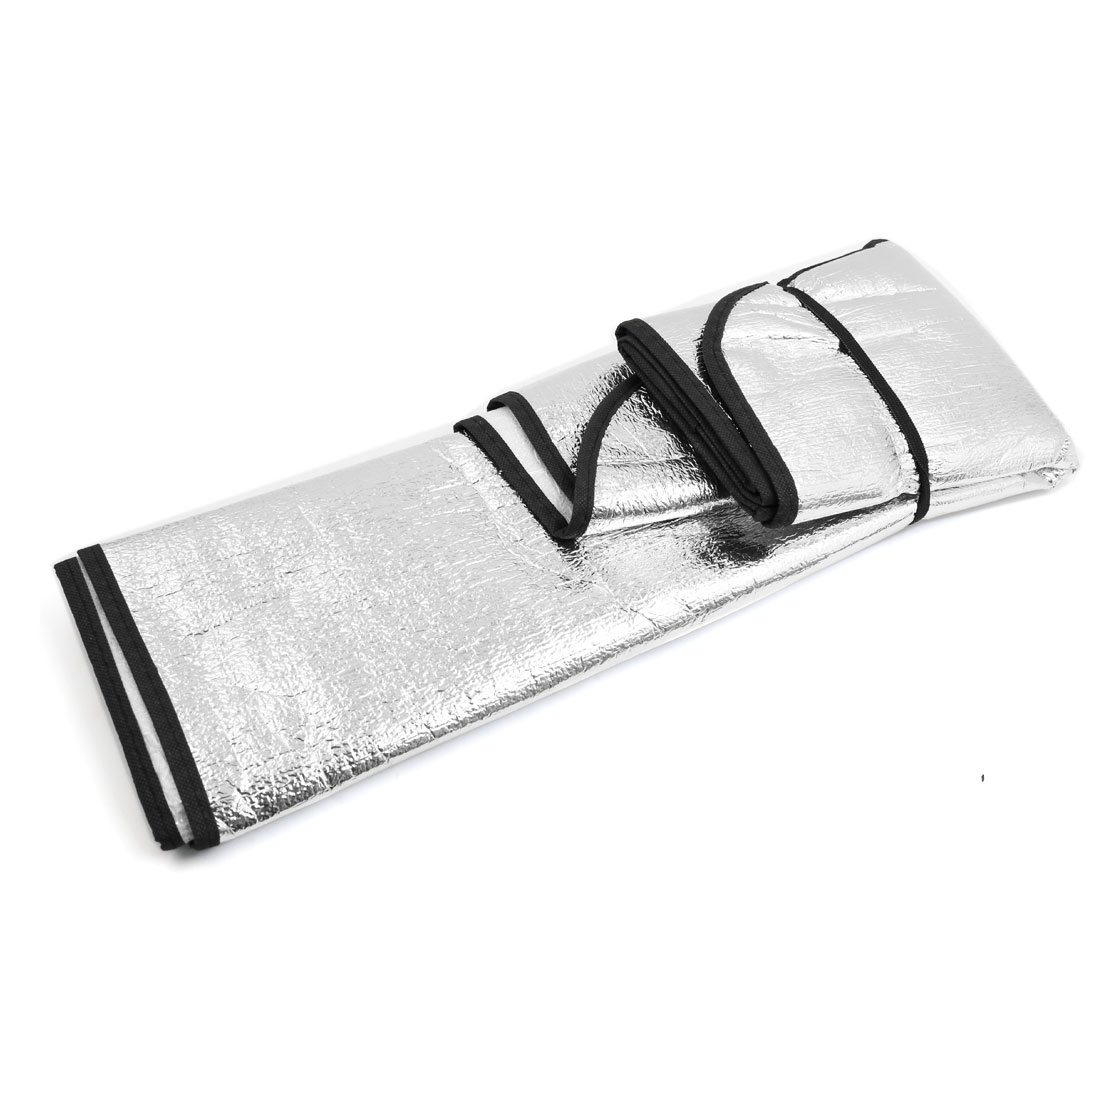 Sliver Tone Aluminum Foil Snow Heat Resistant Auto Car Windshield Sunshade - image 1 of 3